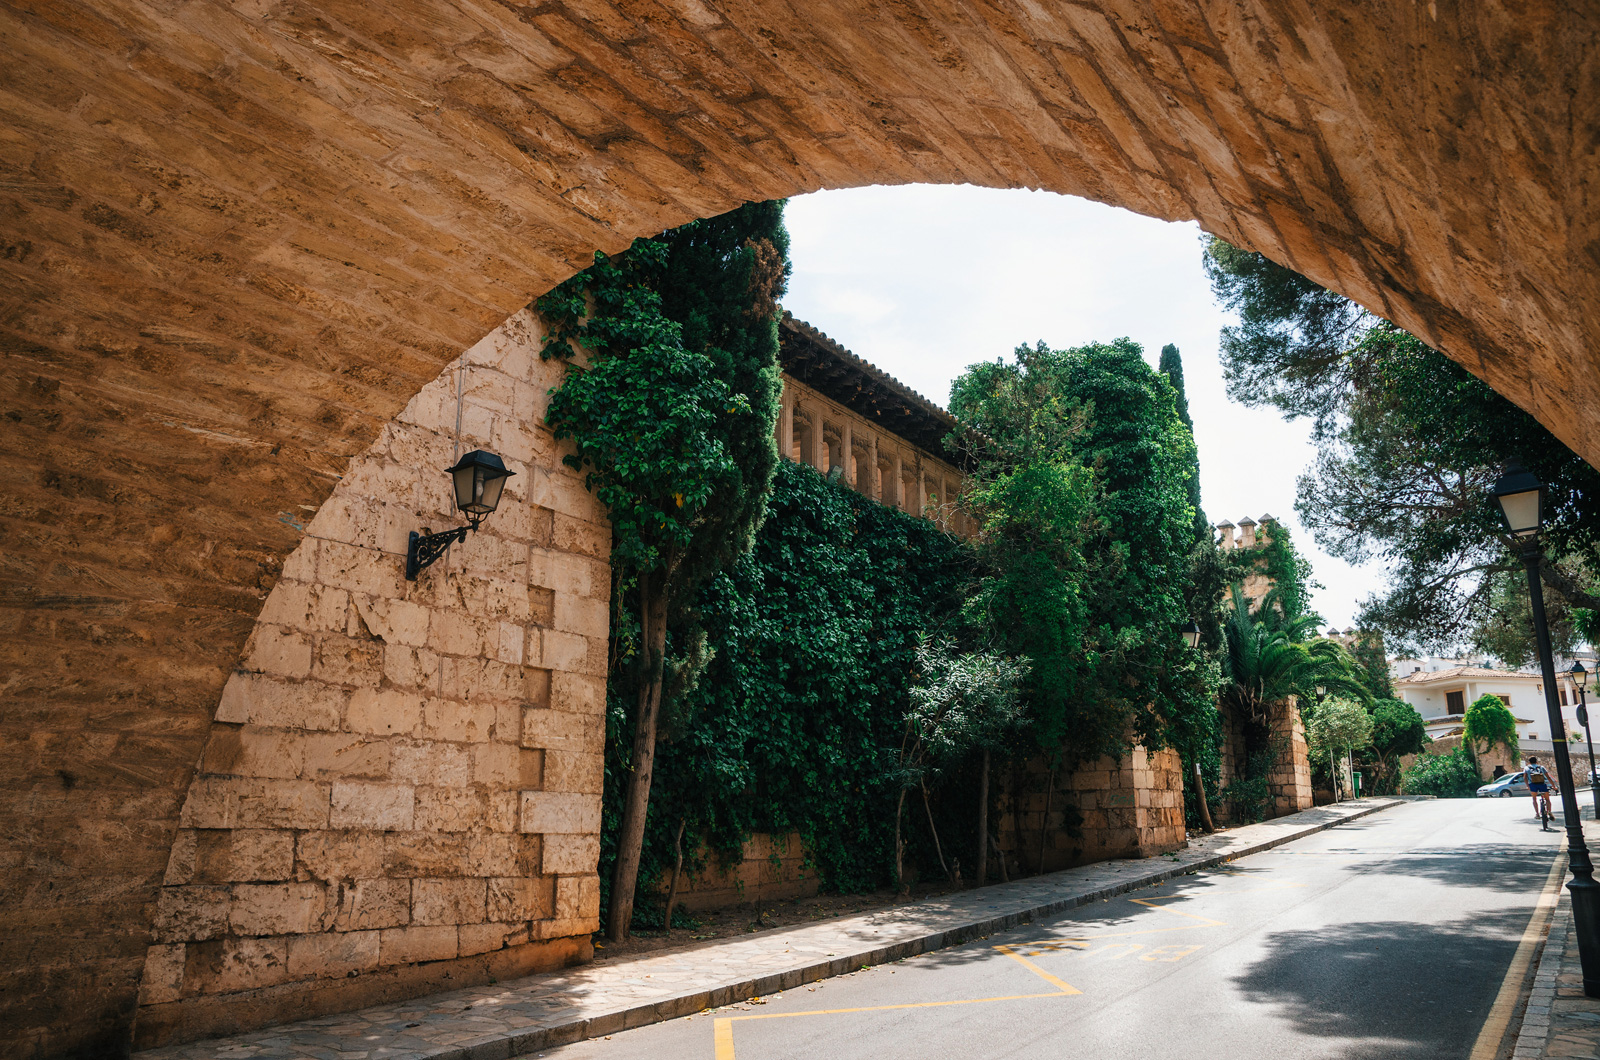 Стены квартала «Испанская деревня», Пальма де Майорка